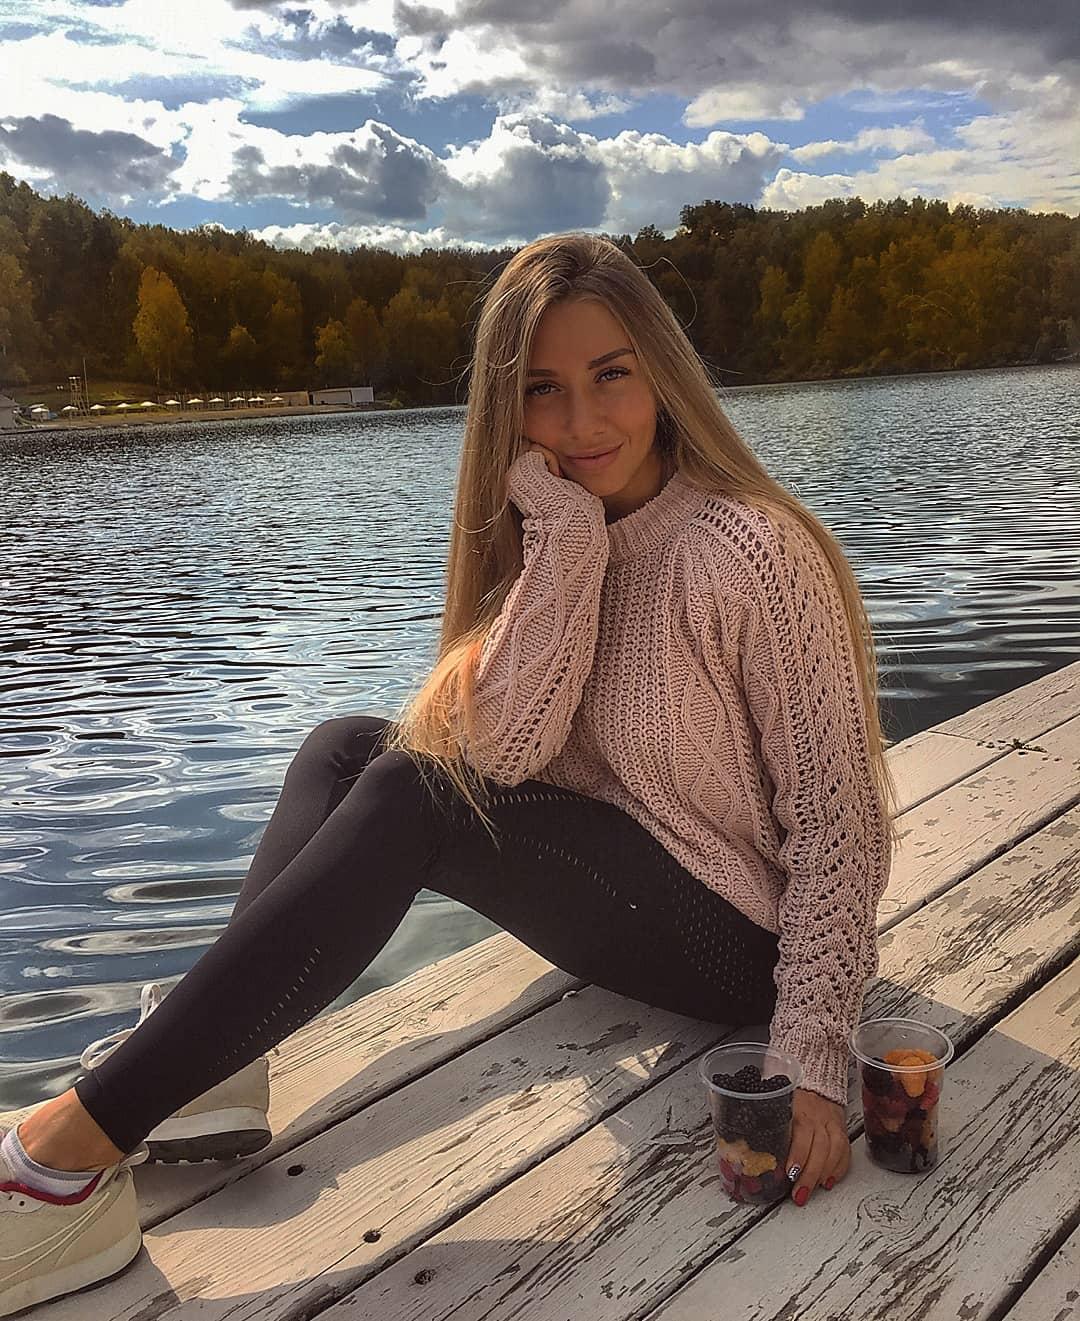 Alina-Cherepanova-Wallpapers-Insta-Fit-Bio-9